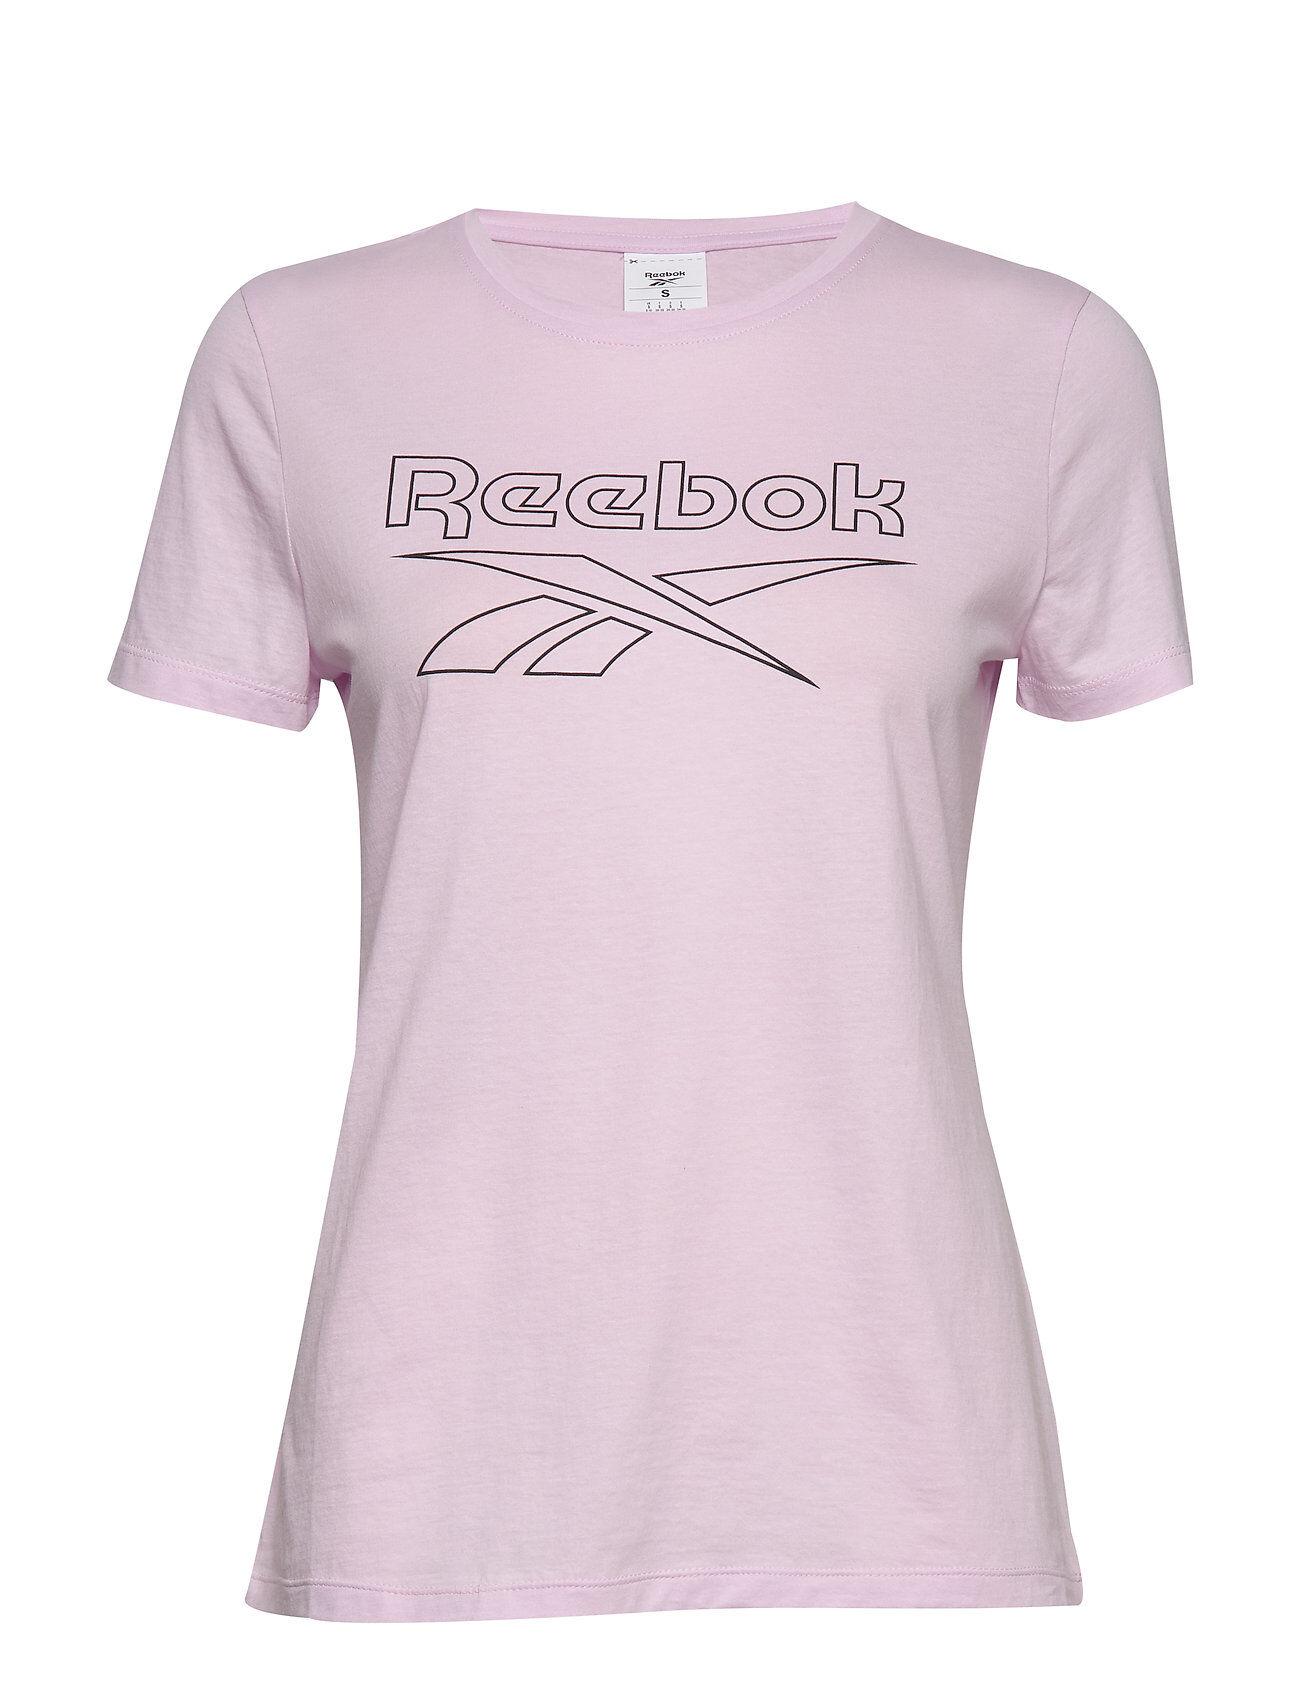 Reebok Performance Te Graphic Tee Delta T-shirts & Tops Short-sleeved Vaaleanpunainen Reebok Performance